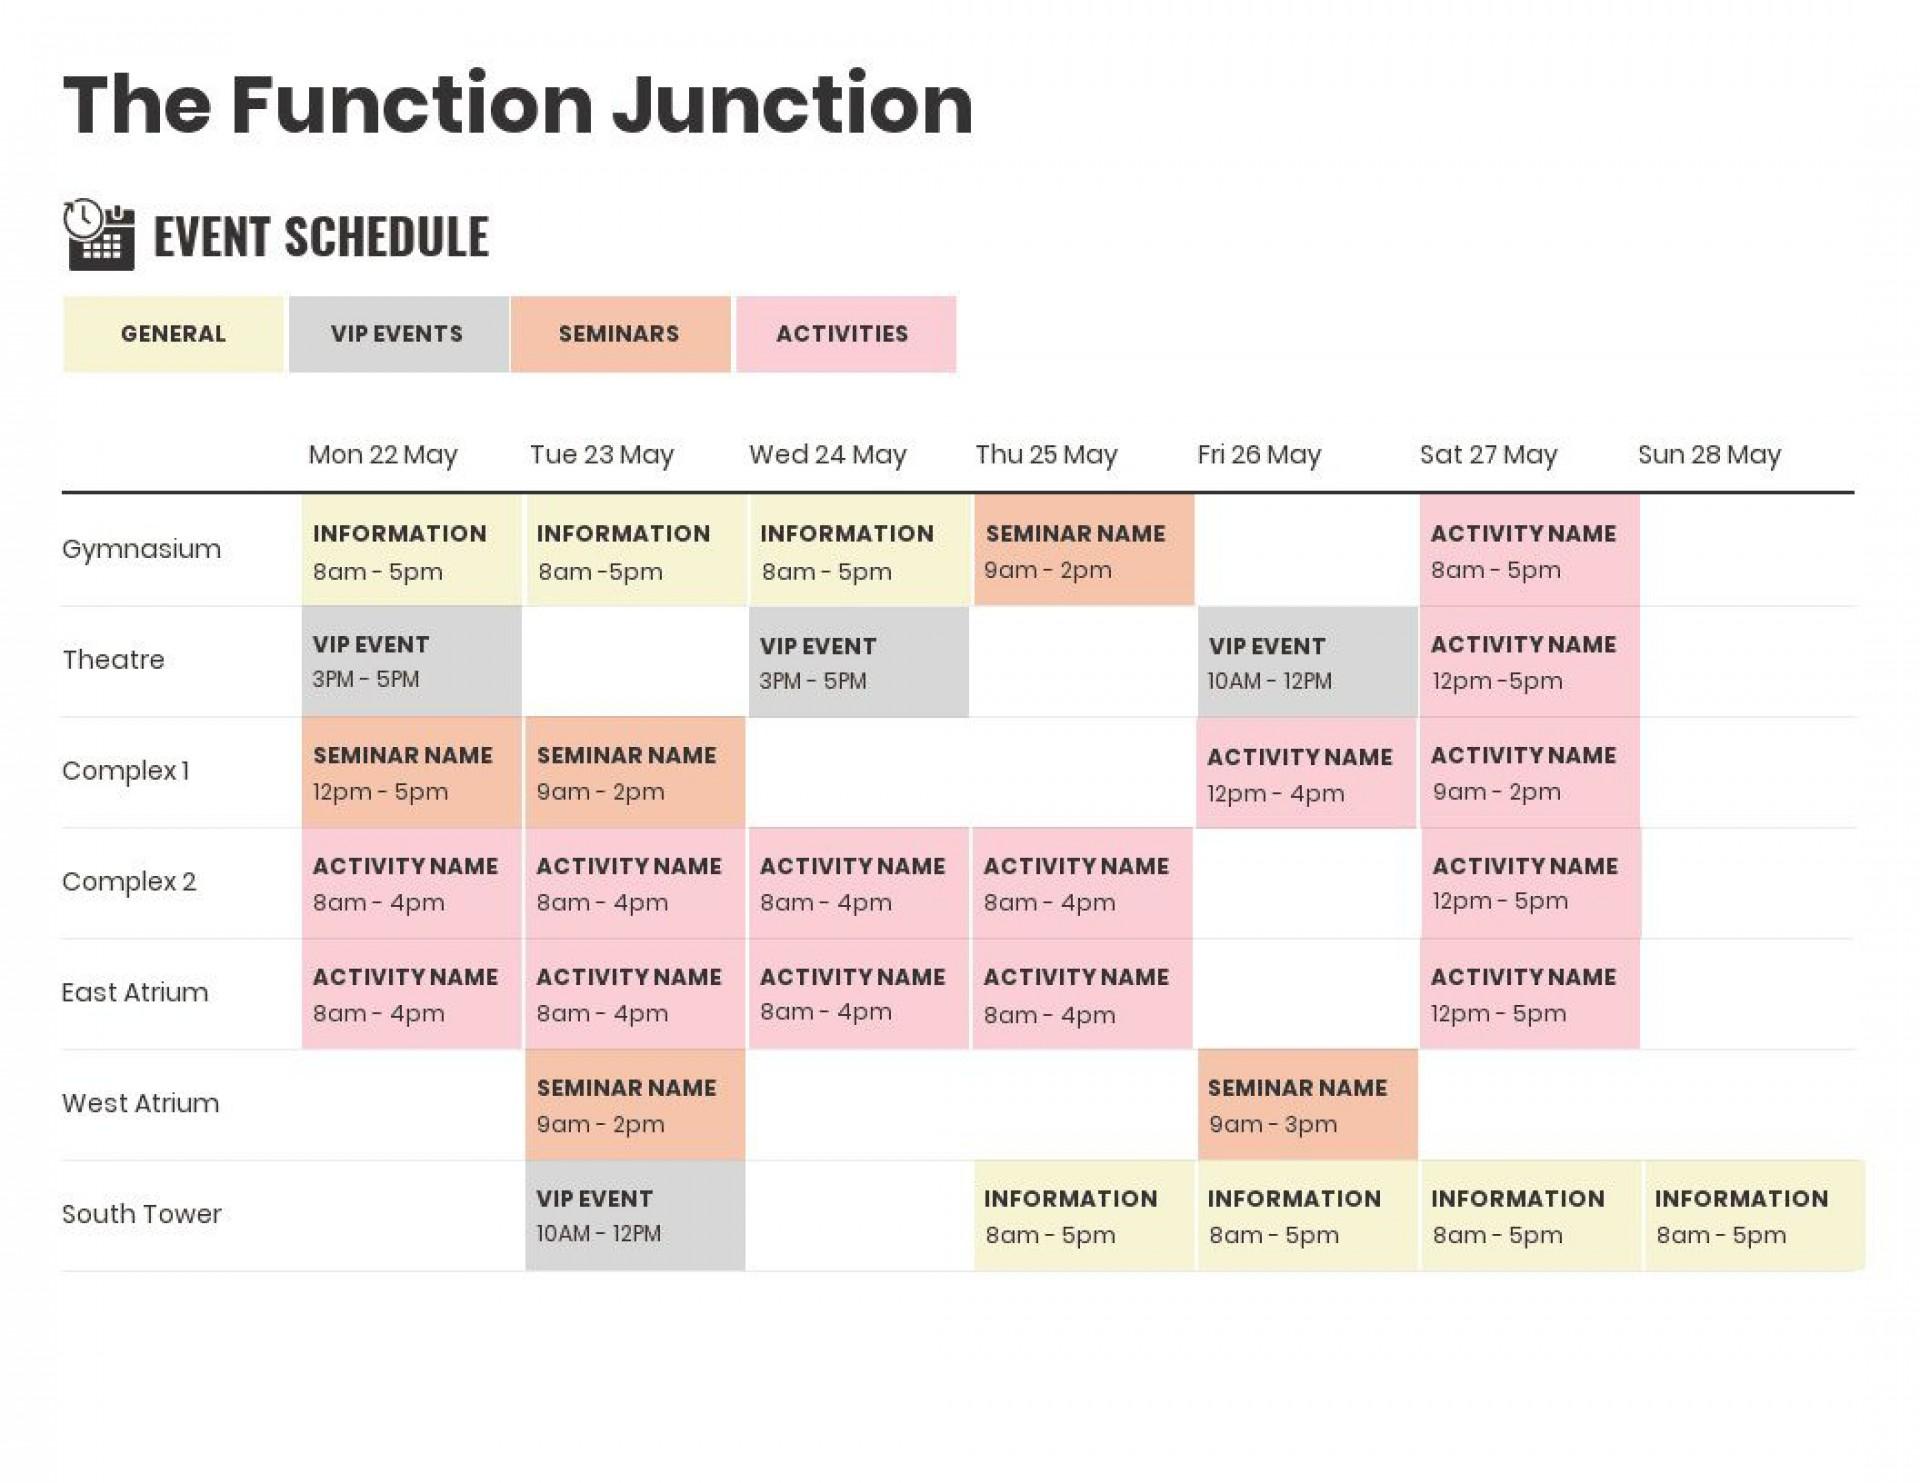 003 Singular Event Planning Timeline Template High Definition  Free Excel1920